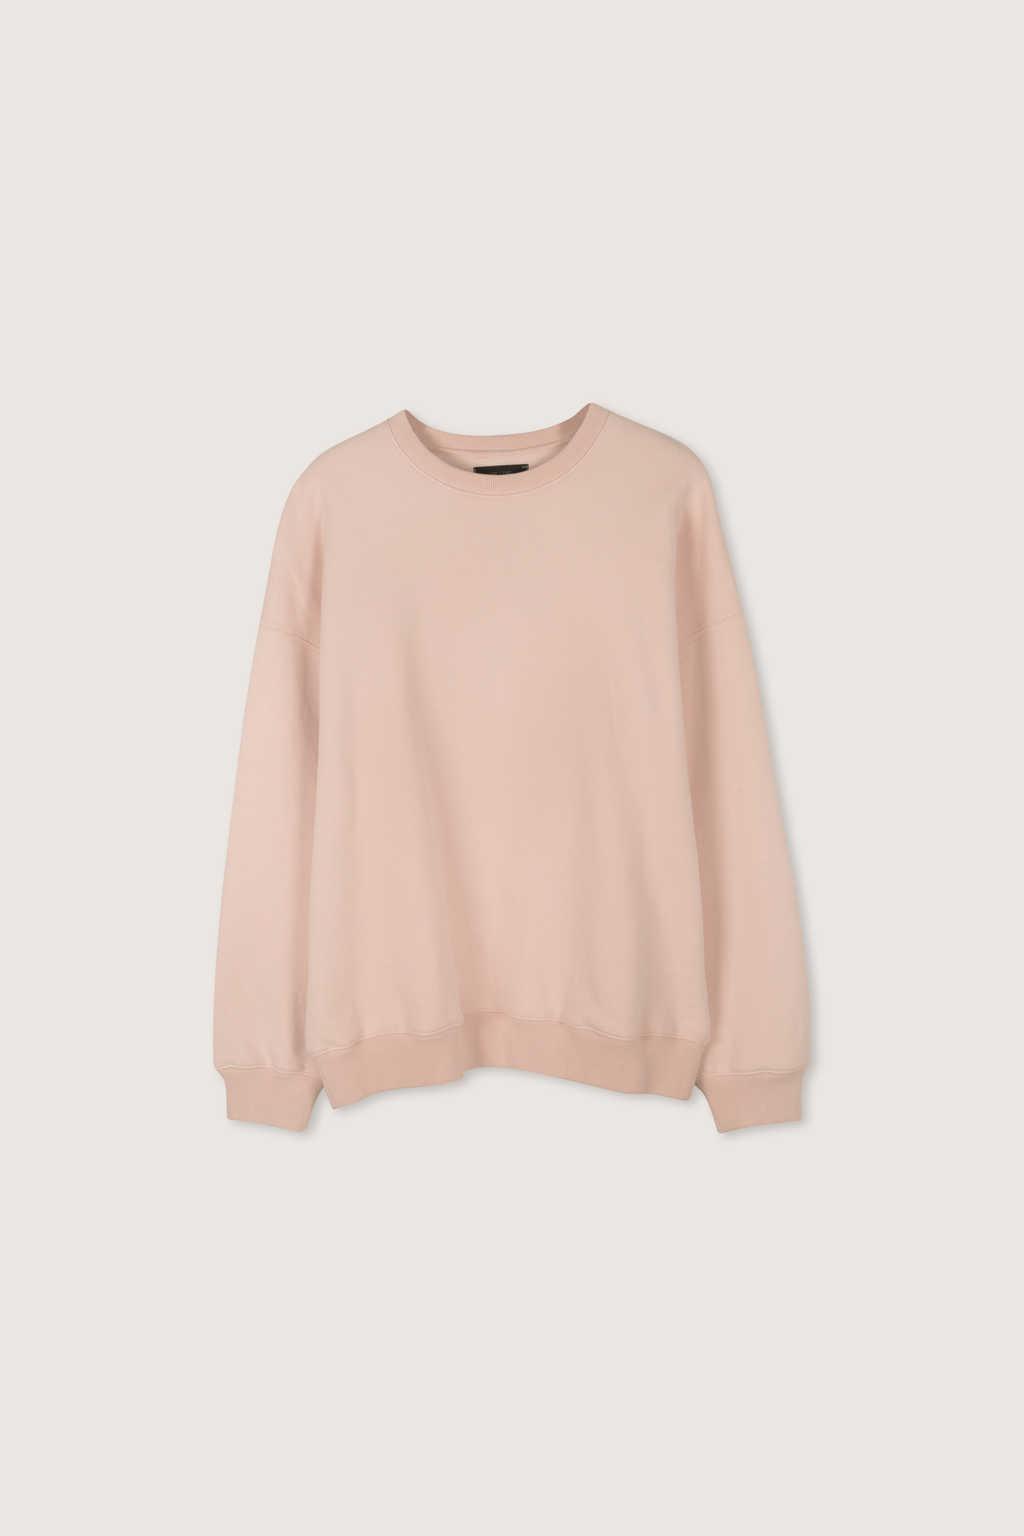 Sweatshirt 1762 Pink 7